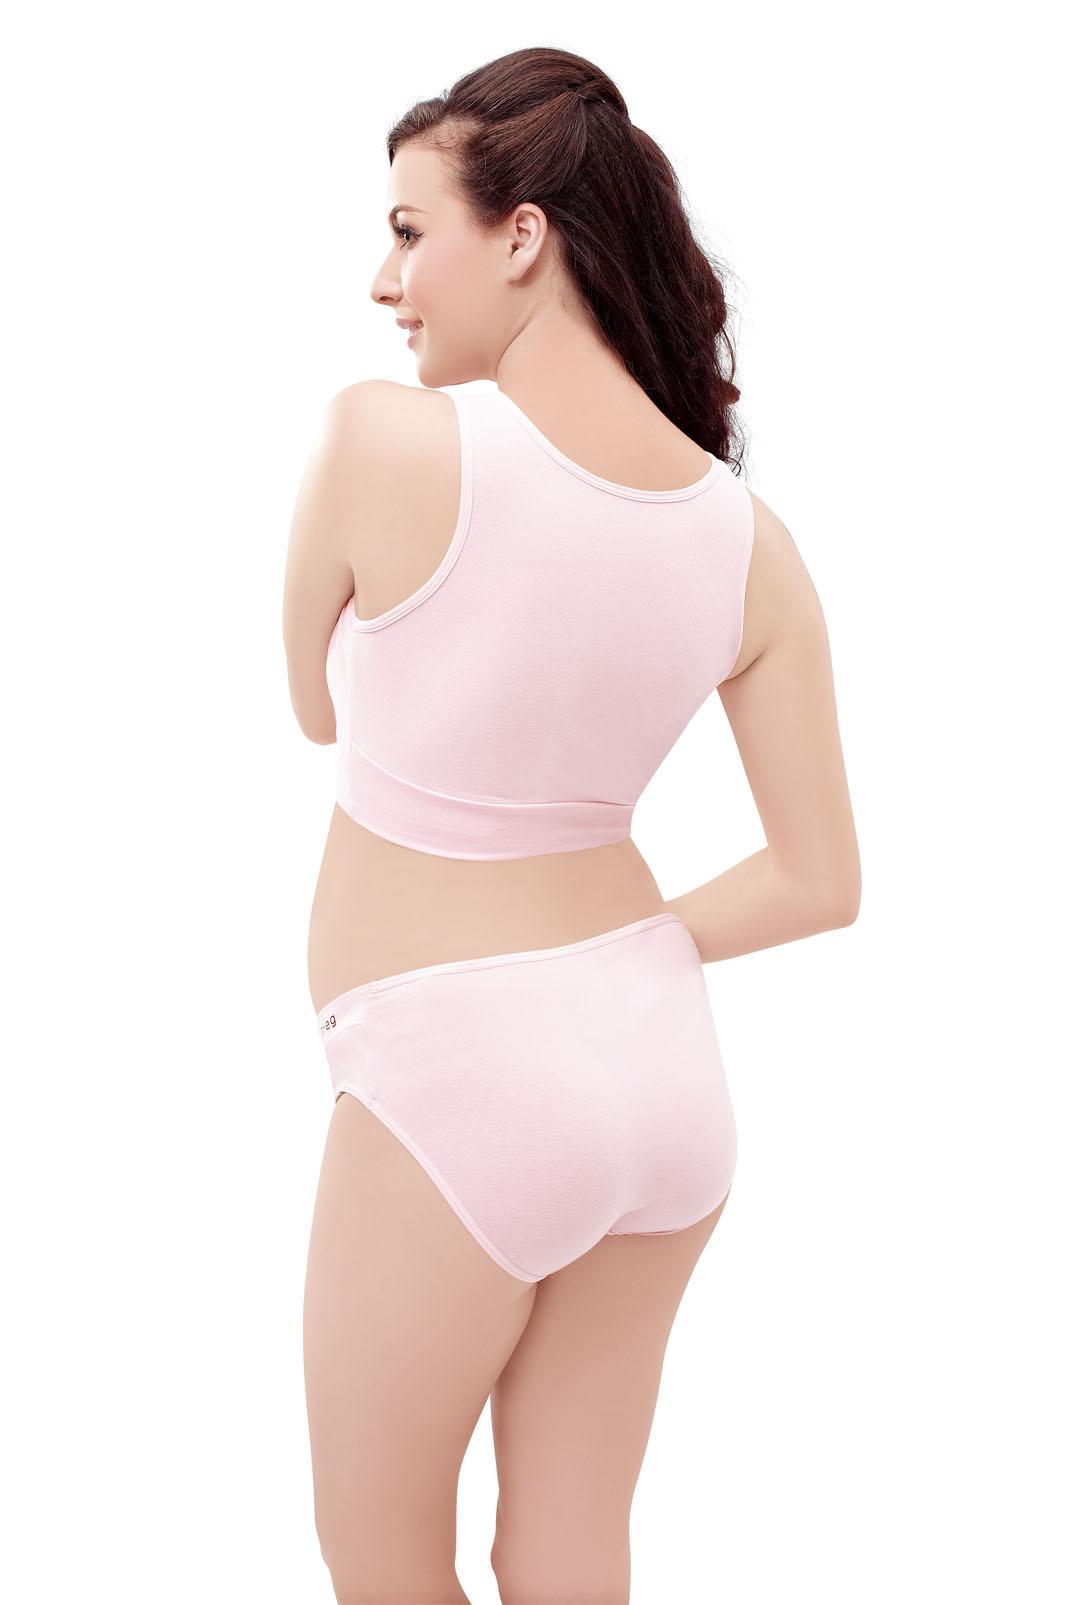 d4b9455bda3f High-grade Pregnant Women Hipster Underwear Unique U Shaped Lingerie ...